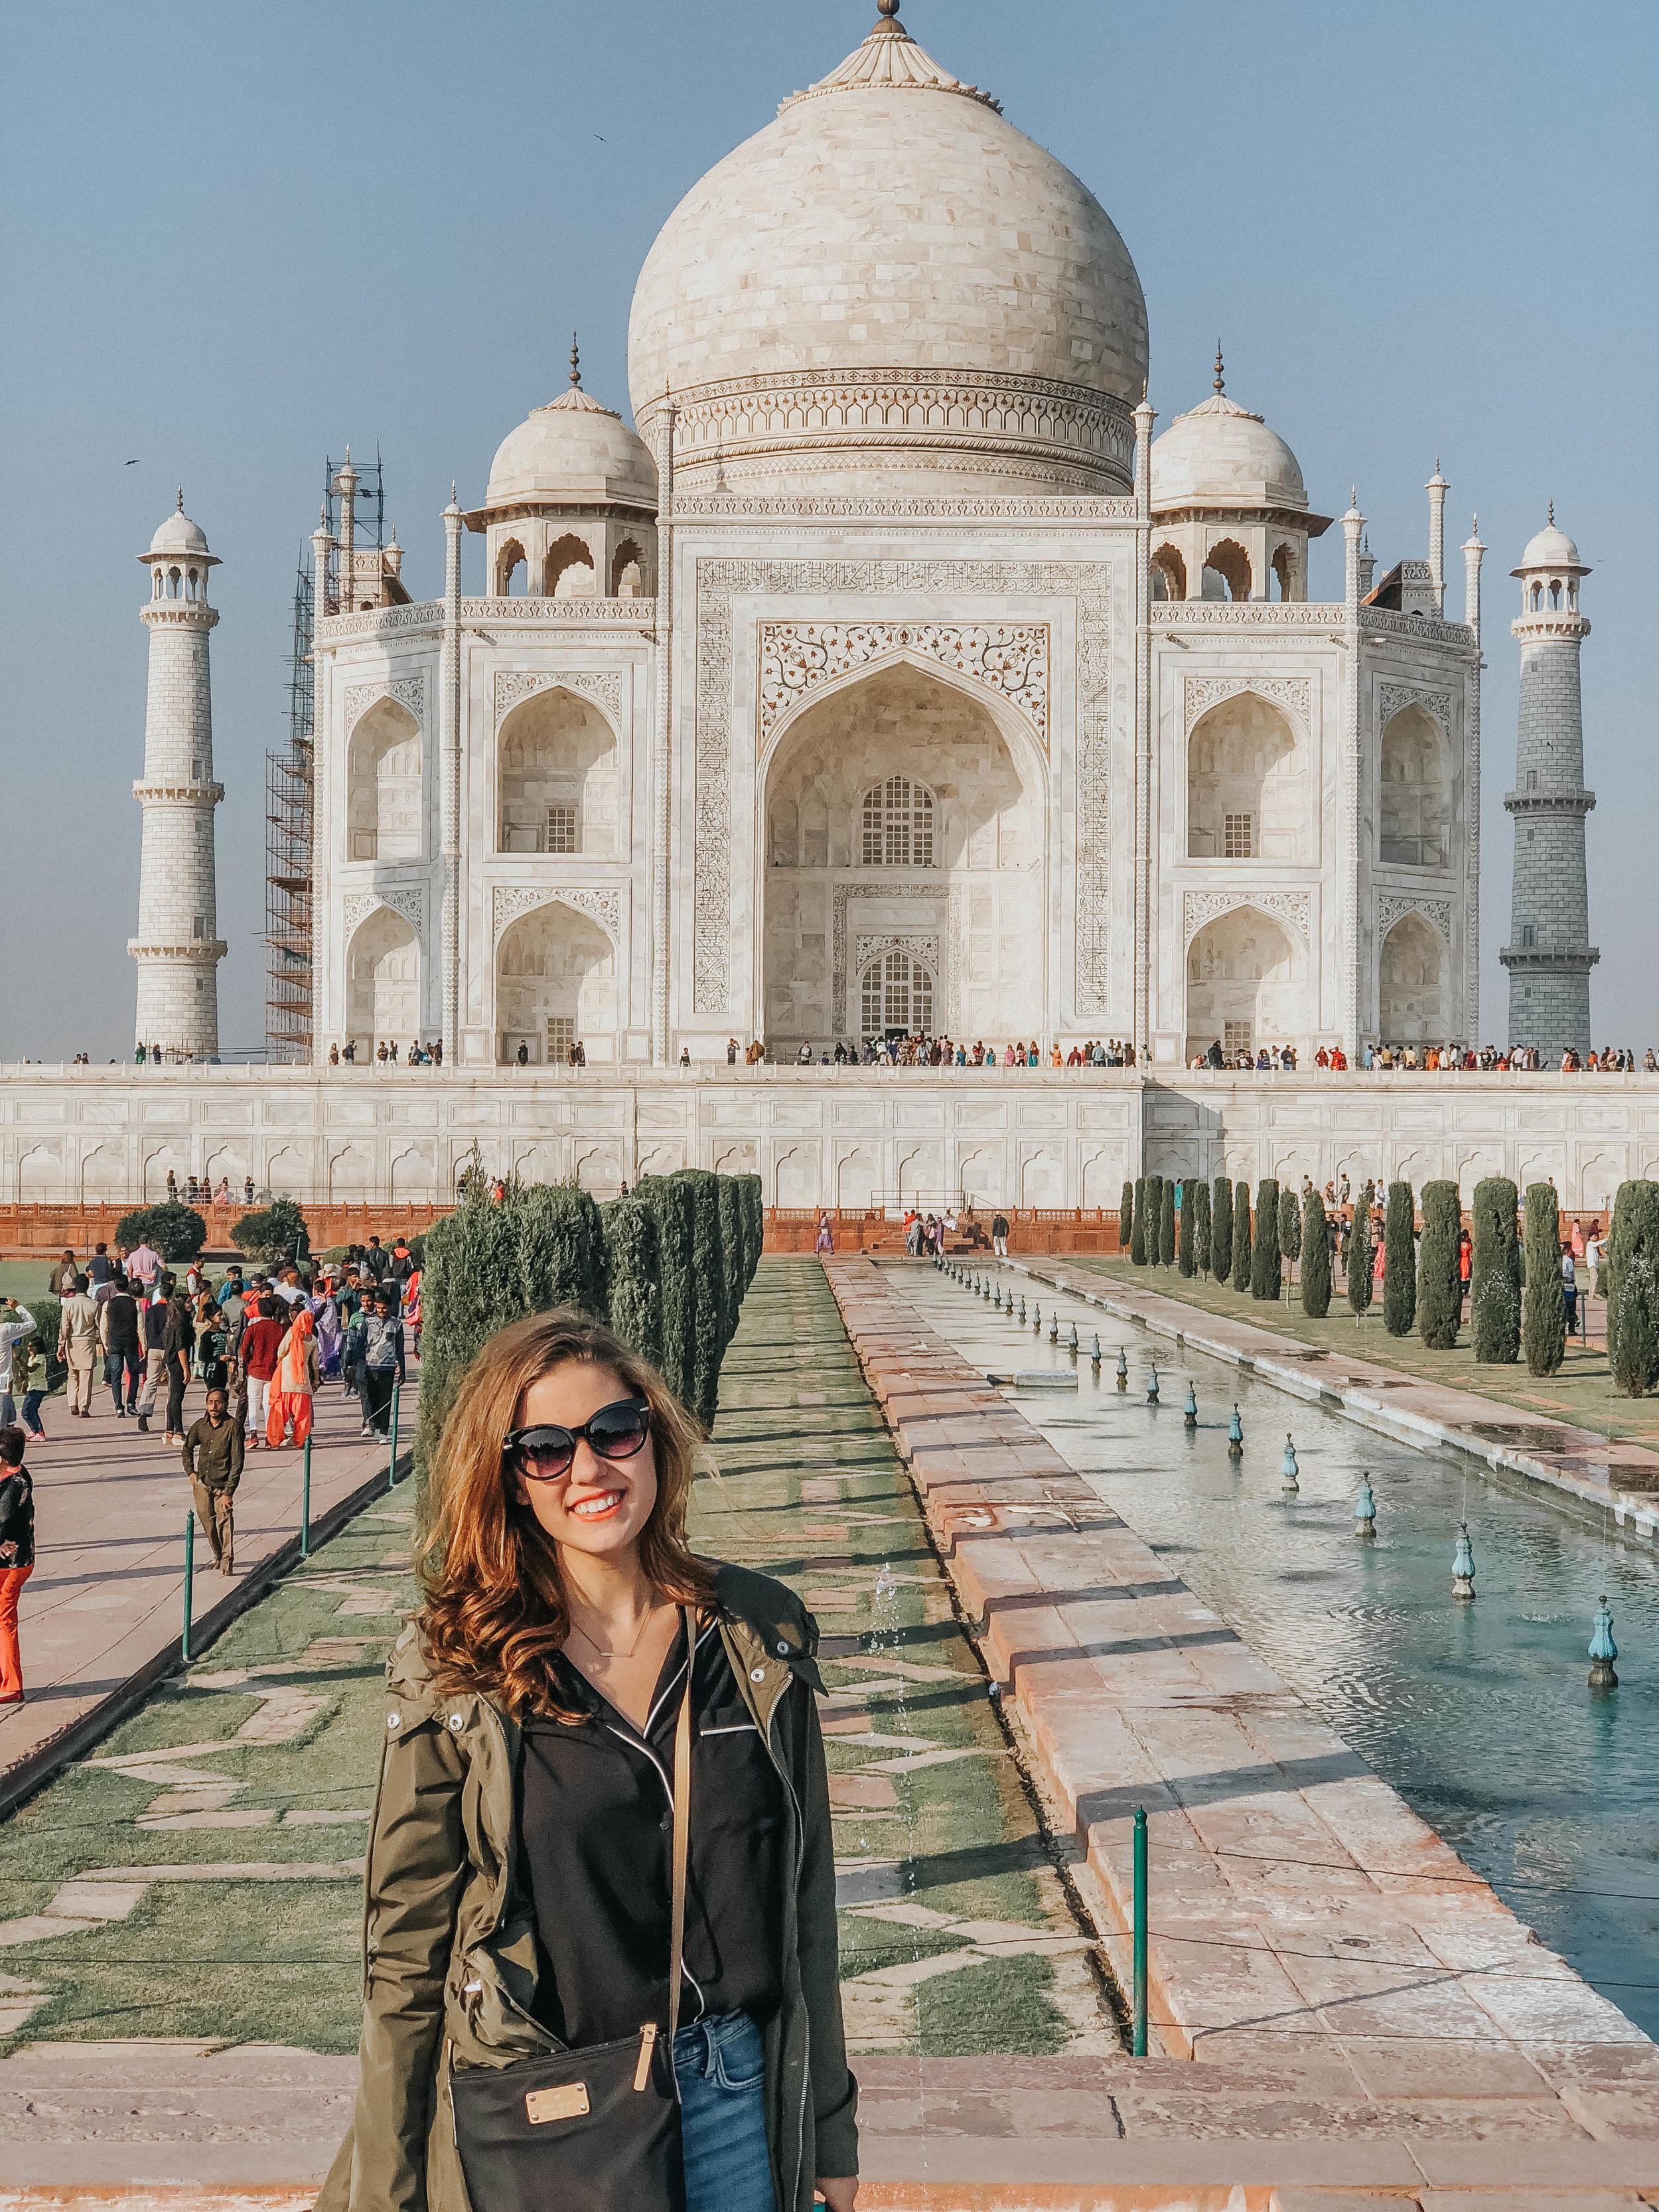 The Taj Mahal   Agra, India